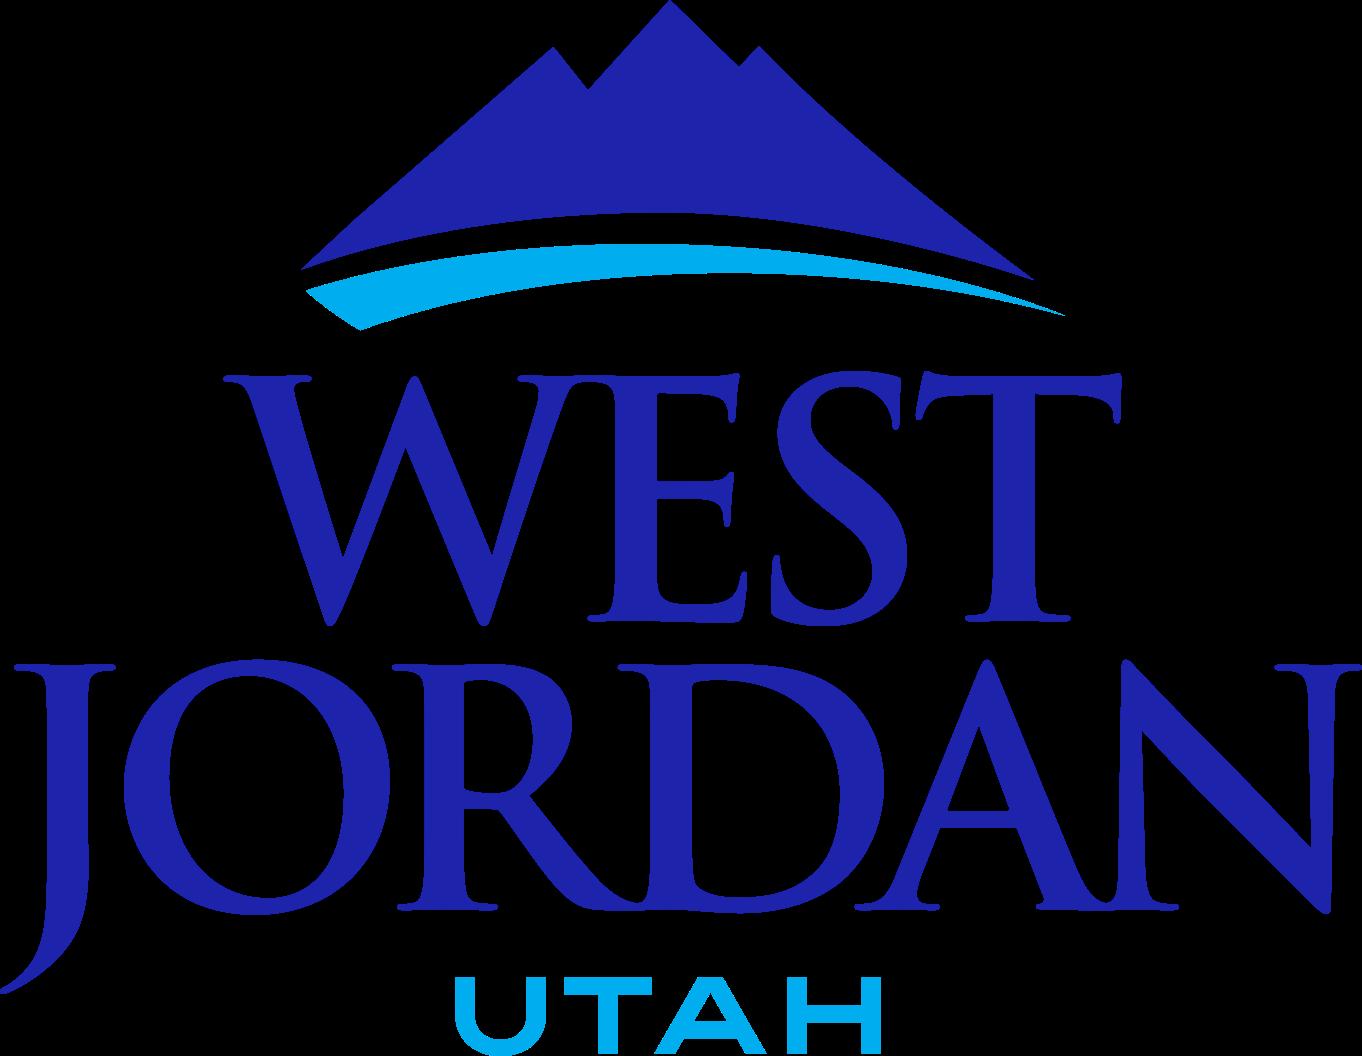 West Jordan City